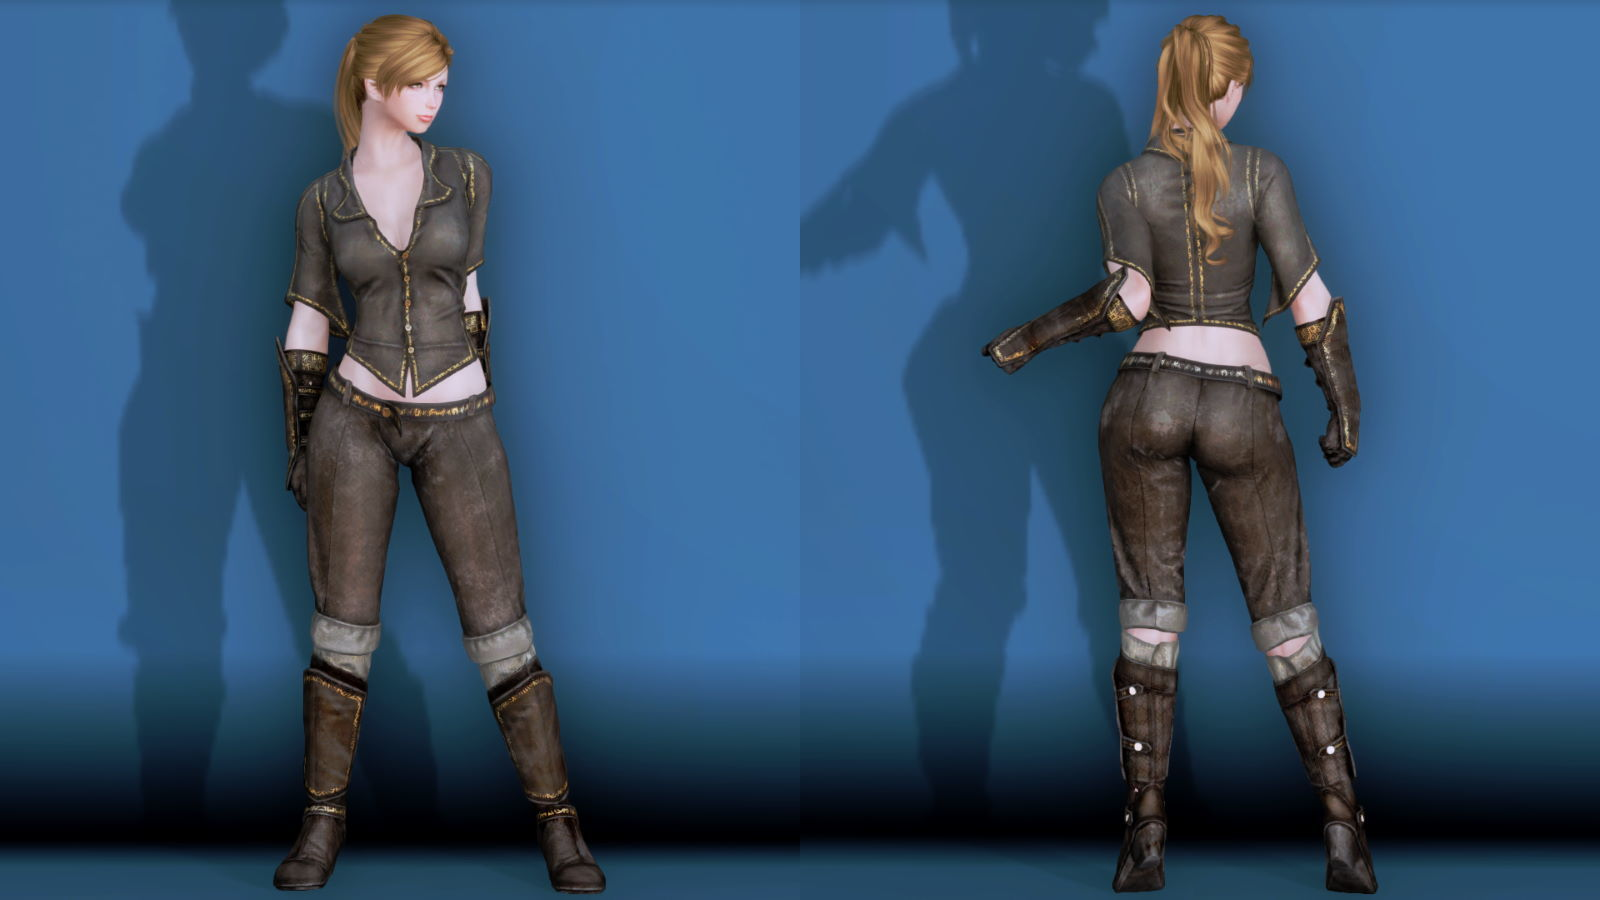 RuggedRogueSSE 141-1 Pose Fu-Ba-F Blouse Trouser W 2